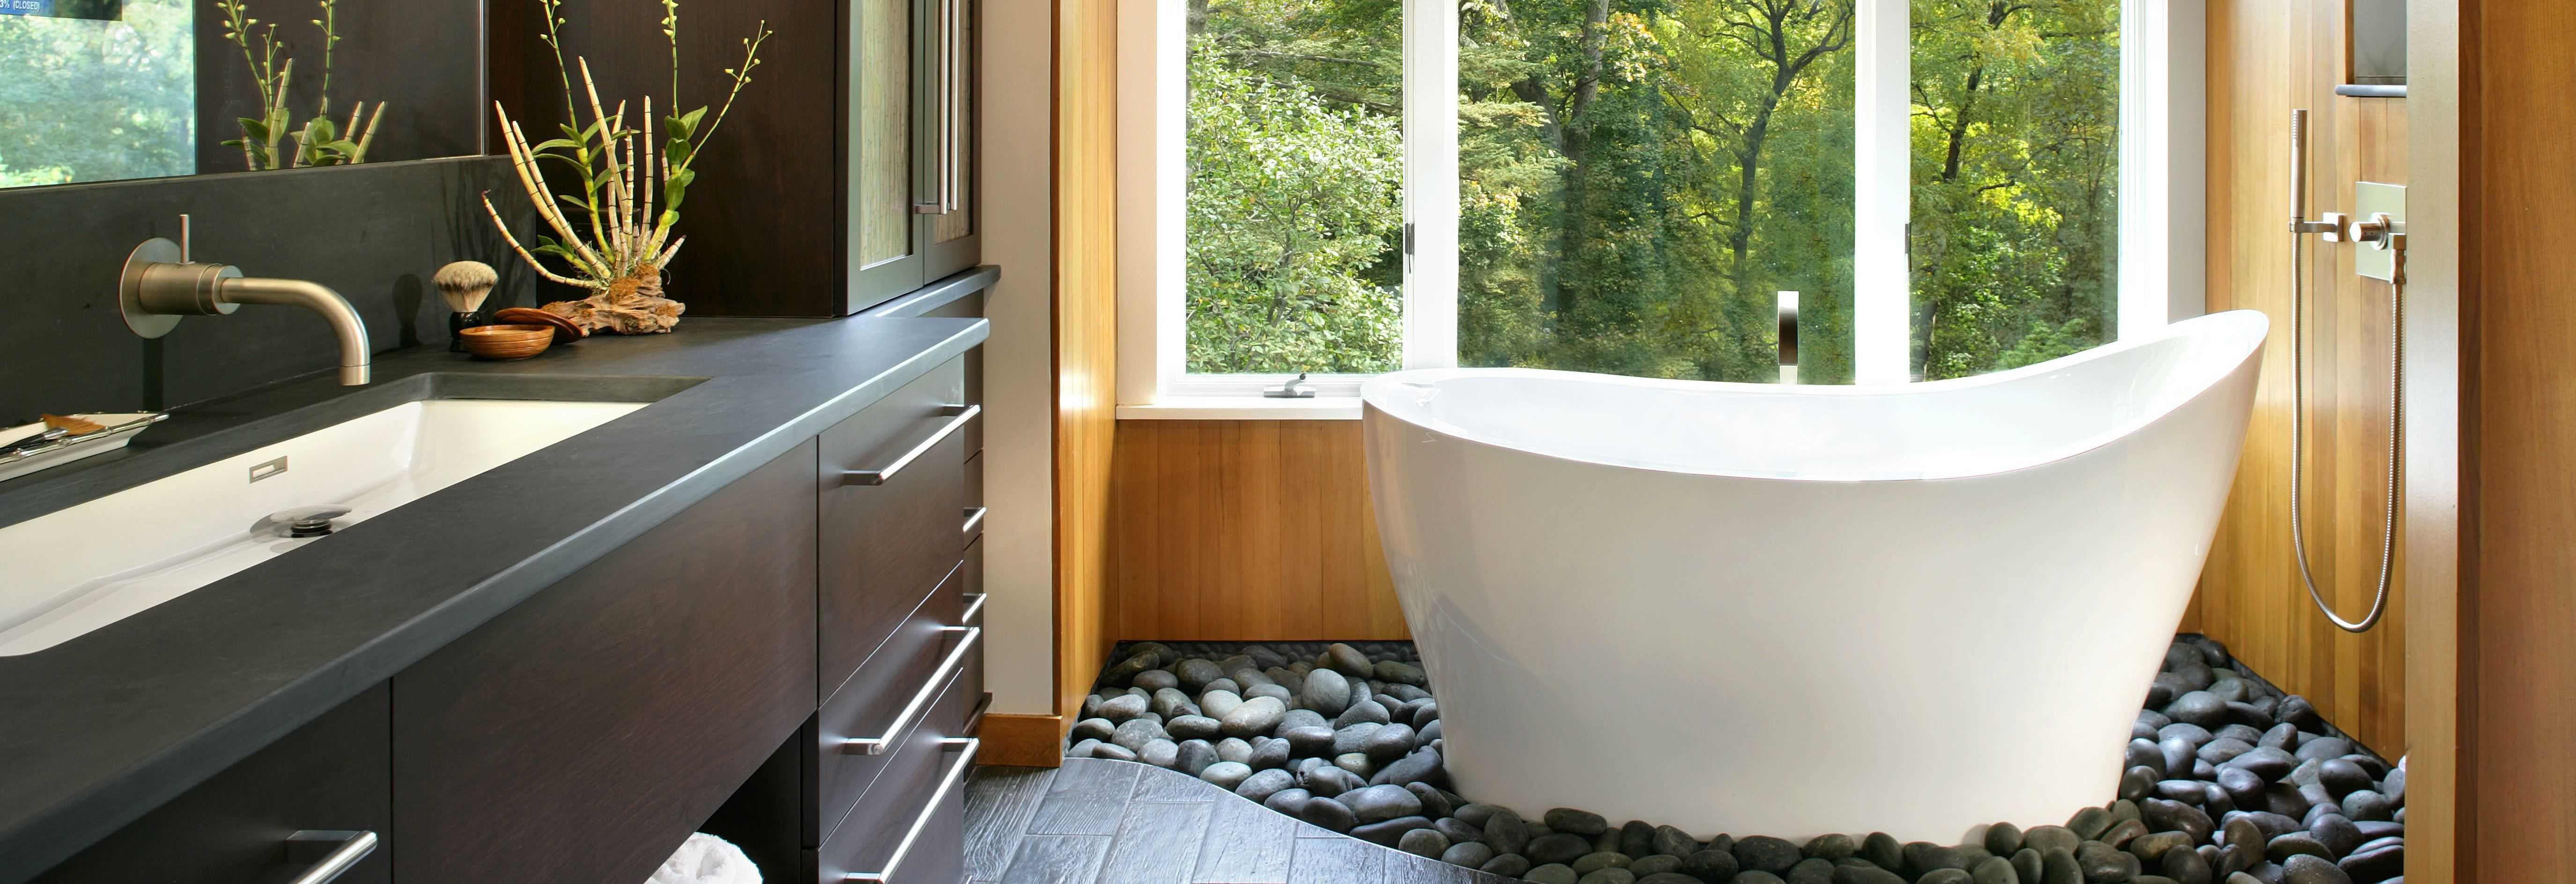 A history of deep soaking tubs part 2 cabuchon for Award winning small bathroom designs